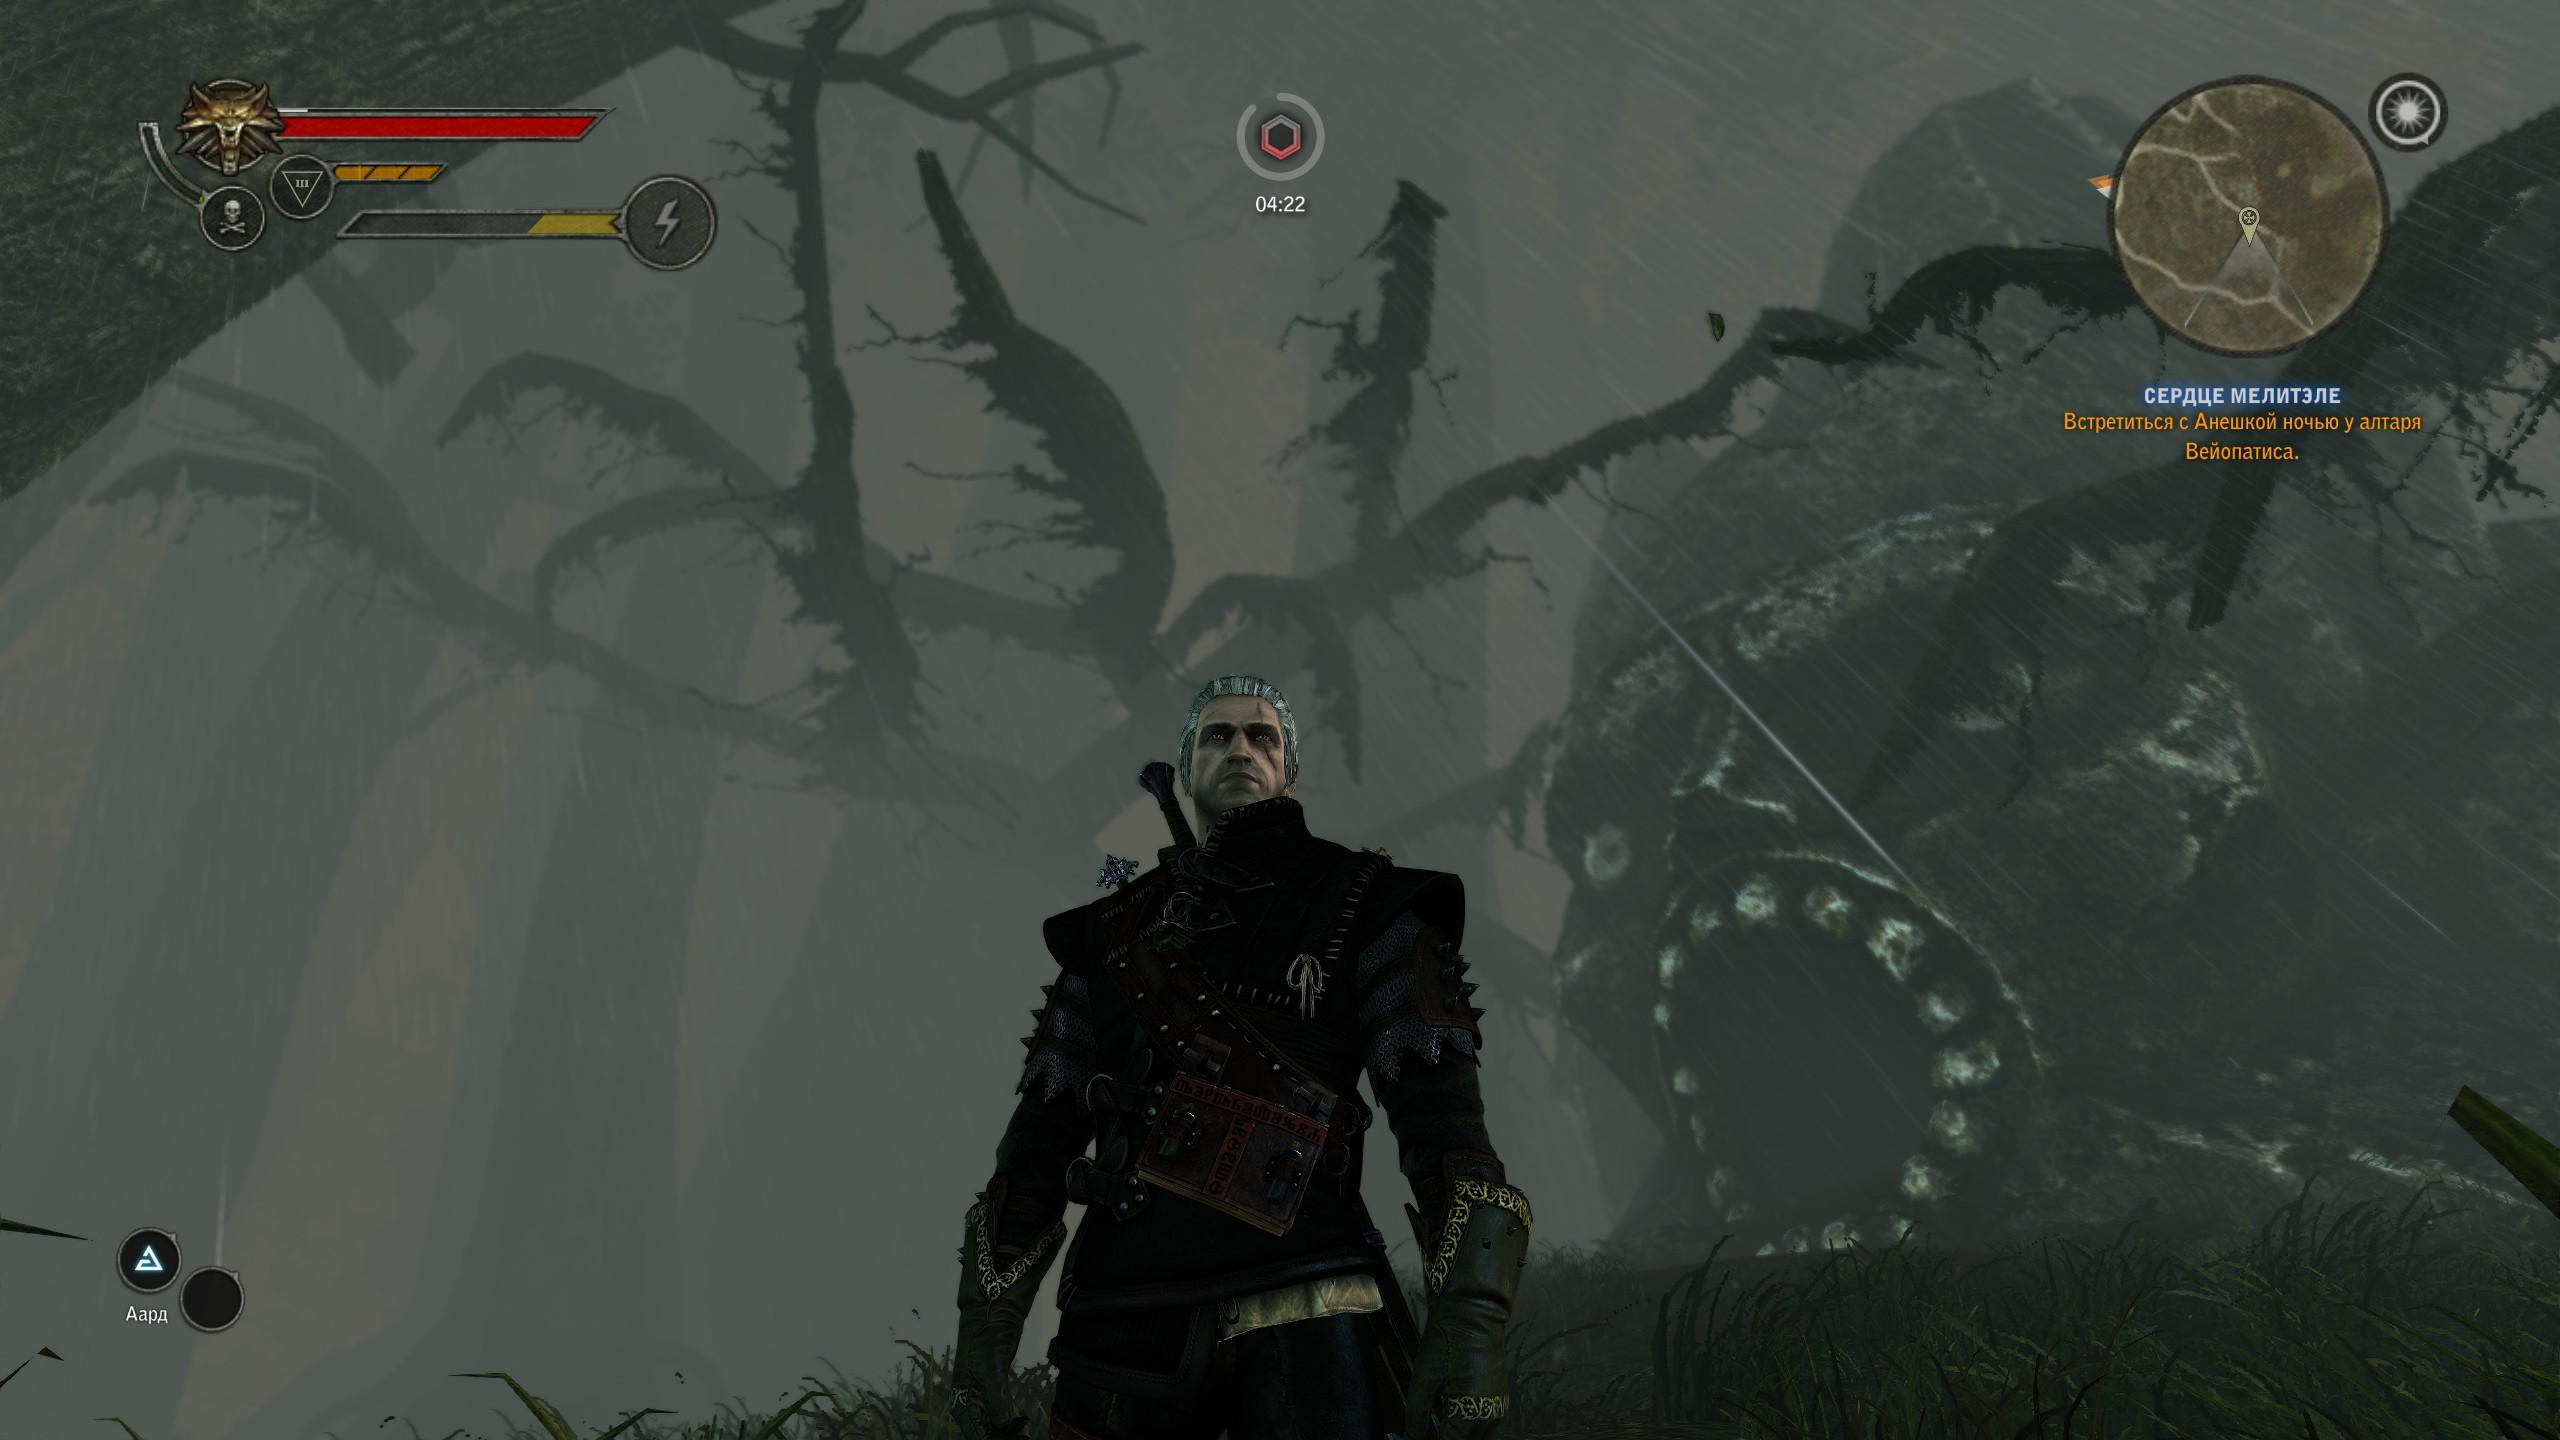 Дождики в лесу - The Witcher 2: Assassins of Kings